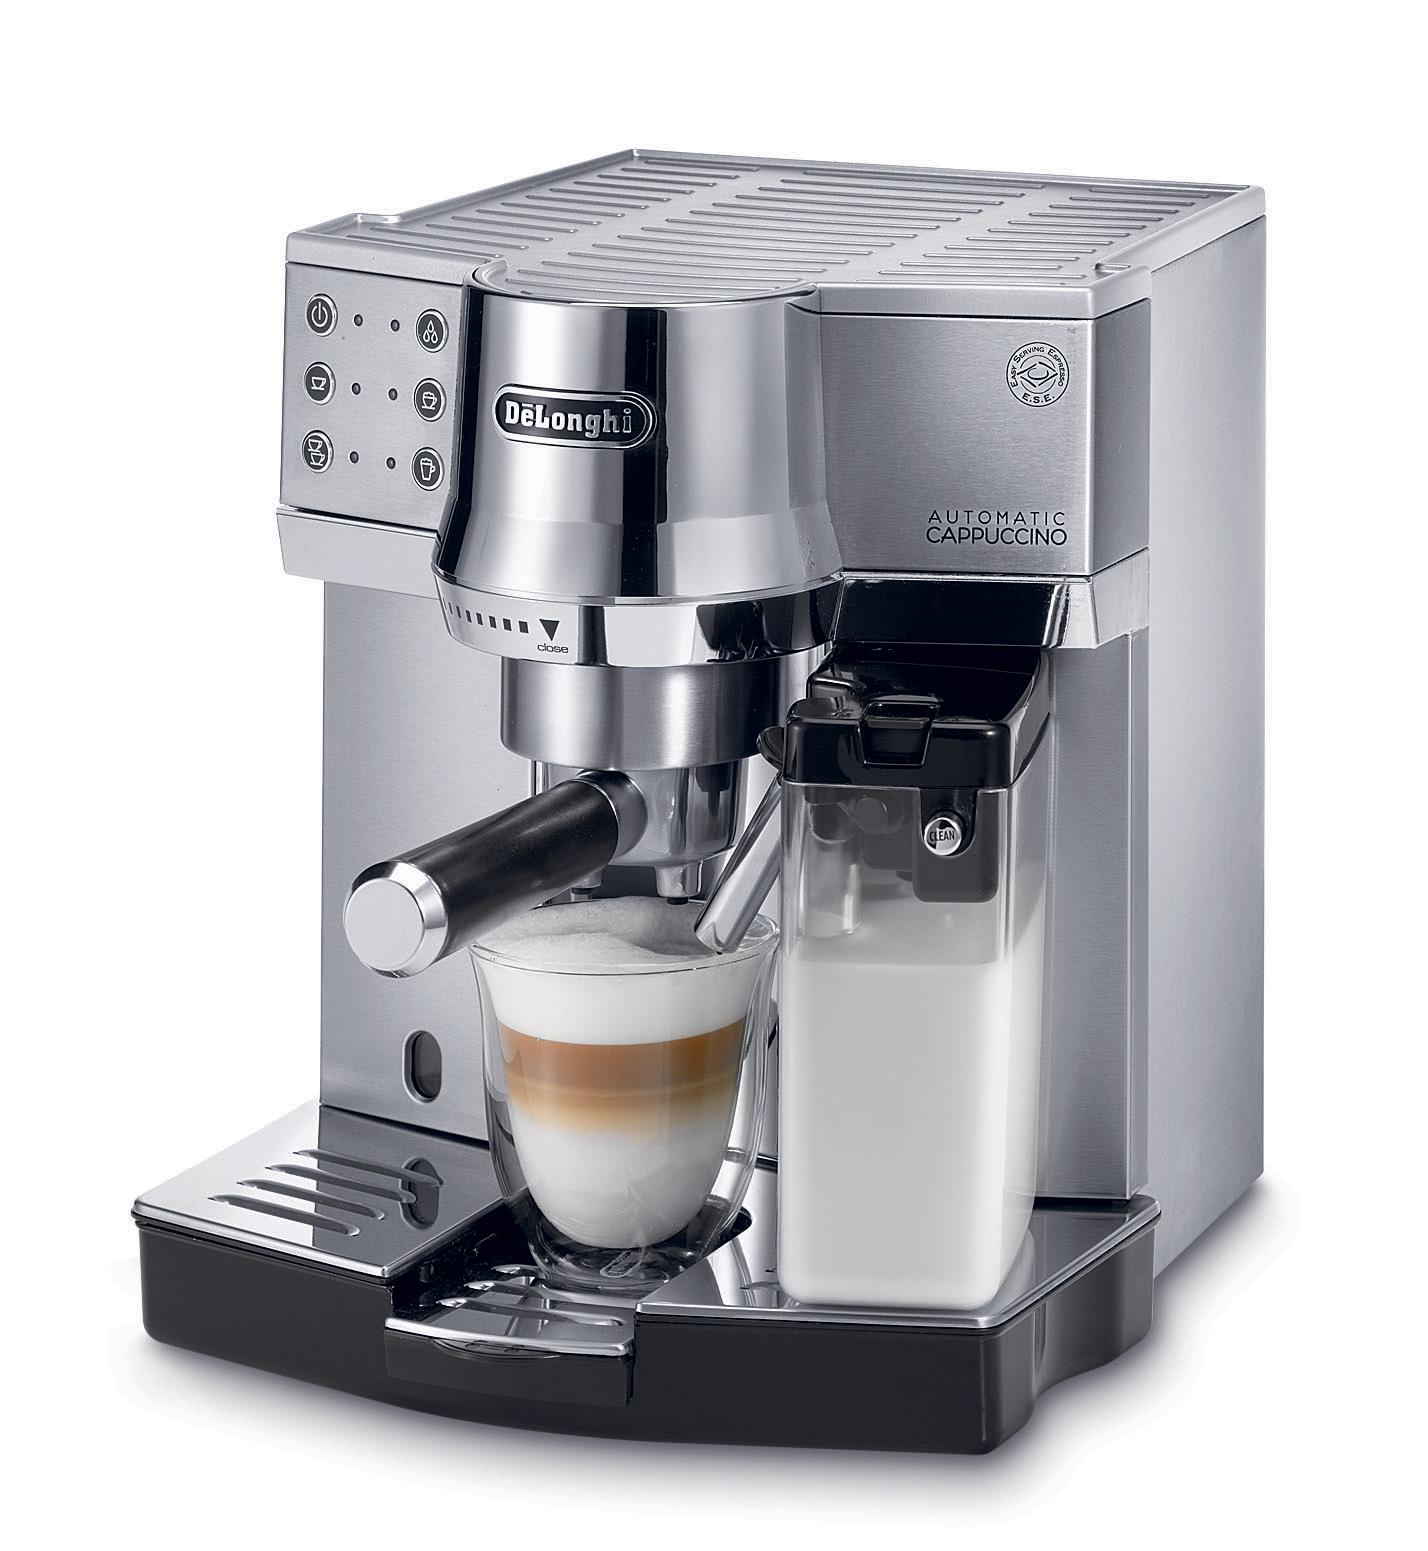 espresso cappuccino oder caff de longhi berrascht mit siebtr ger ec 850. Black Bedroom Furniture Sets. Home Design Ideas